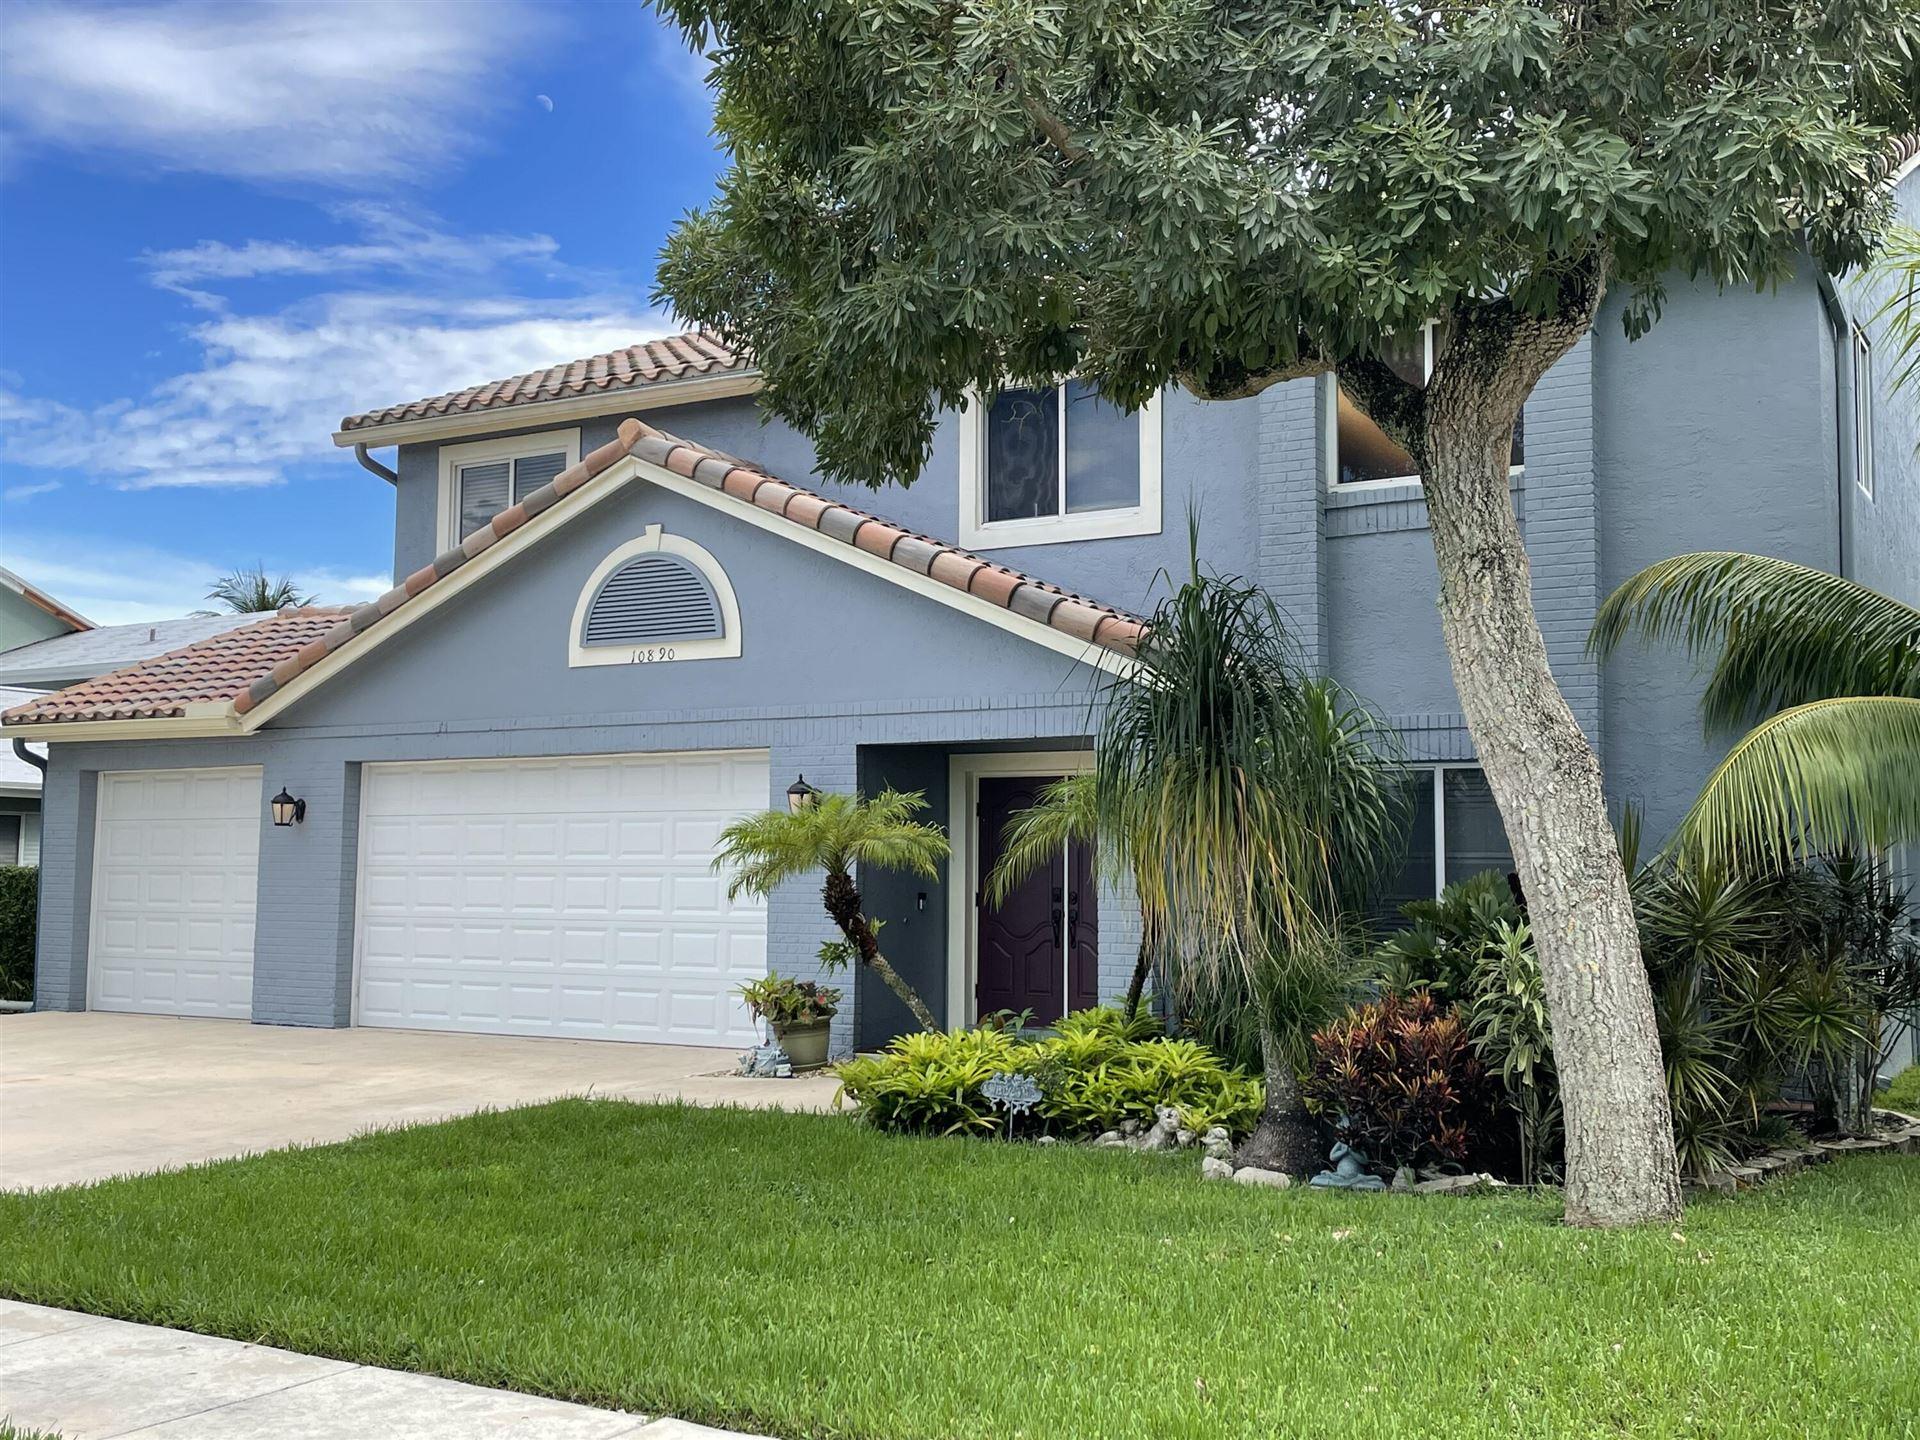 10890 Fox Glen Drive, Boca Raton, FL 33428 - MLS#: RX-10745262